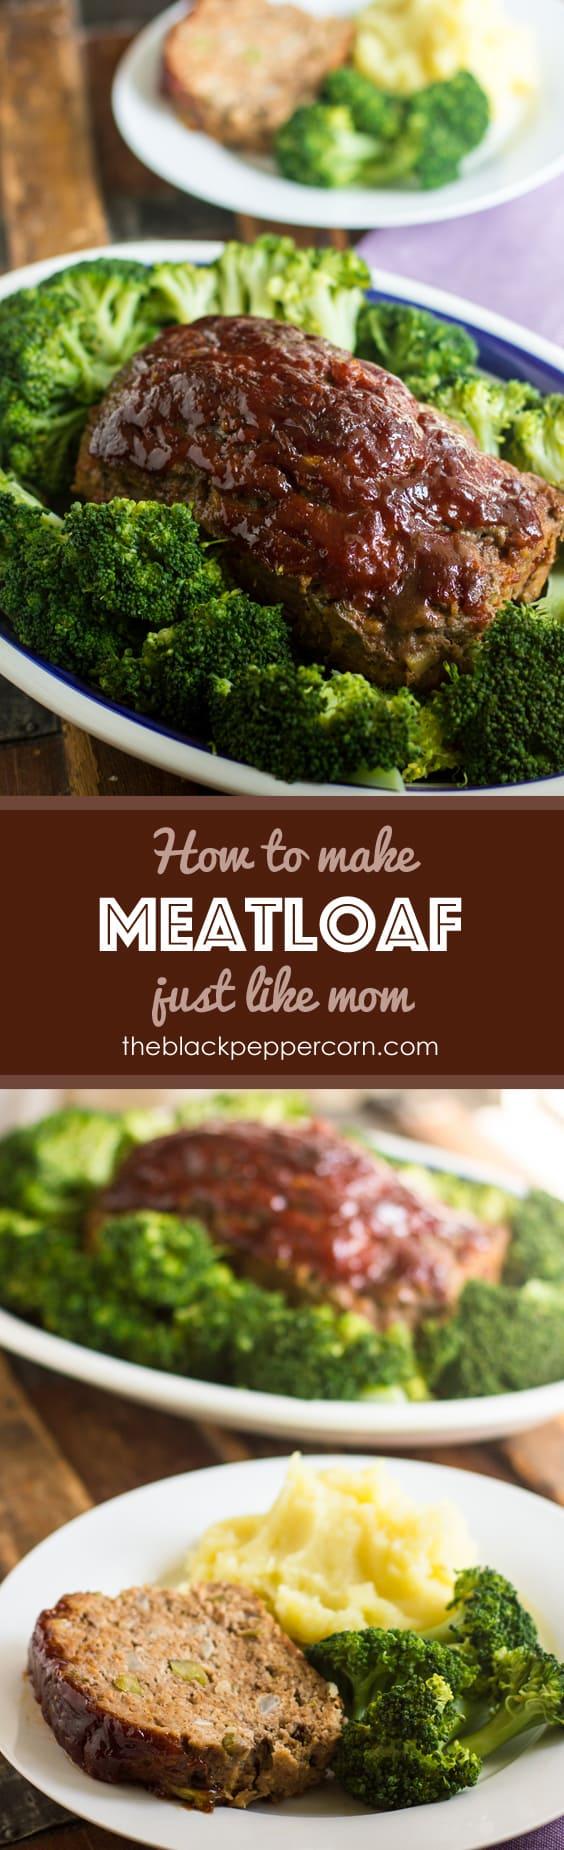 Easy meatloaf recipe the best just like mom comfort food